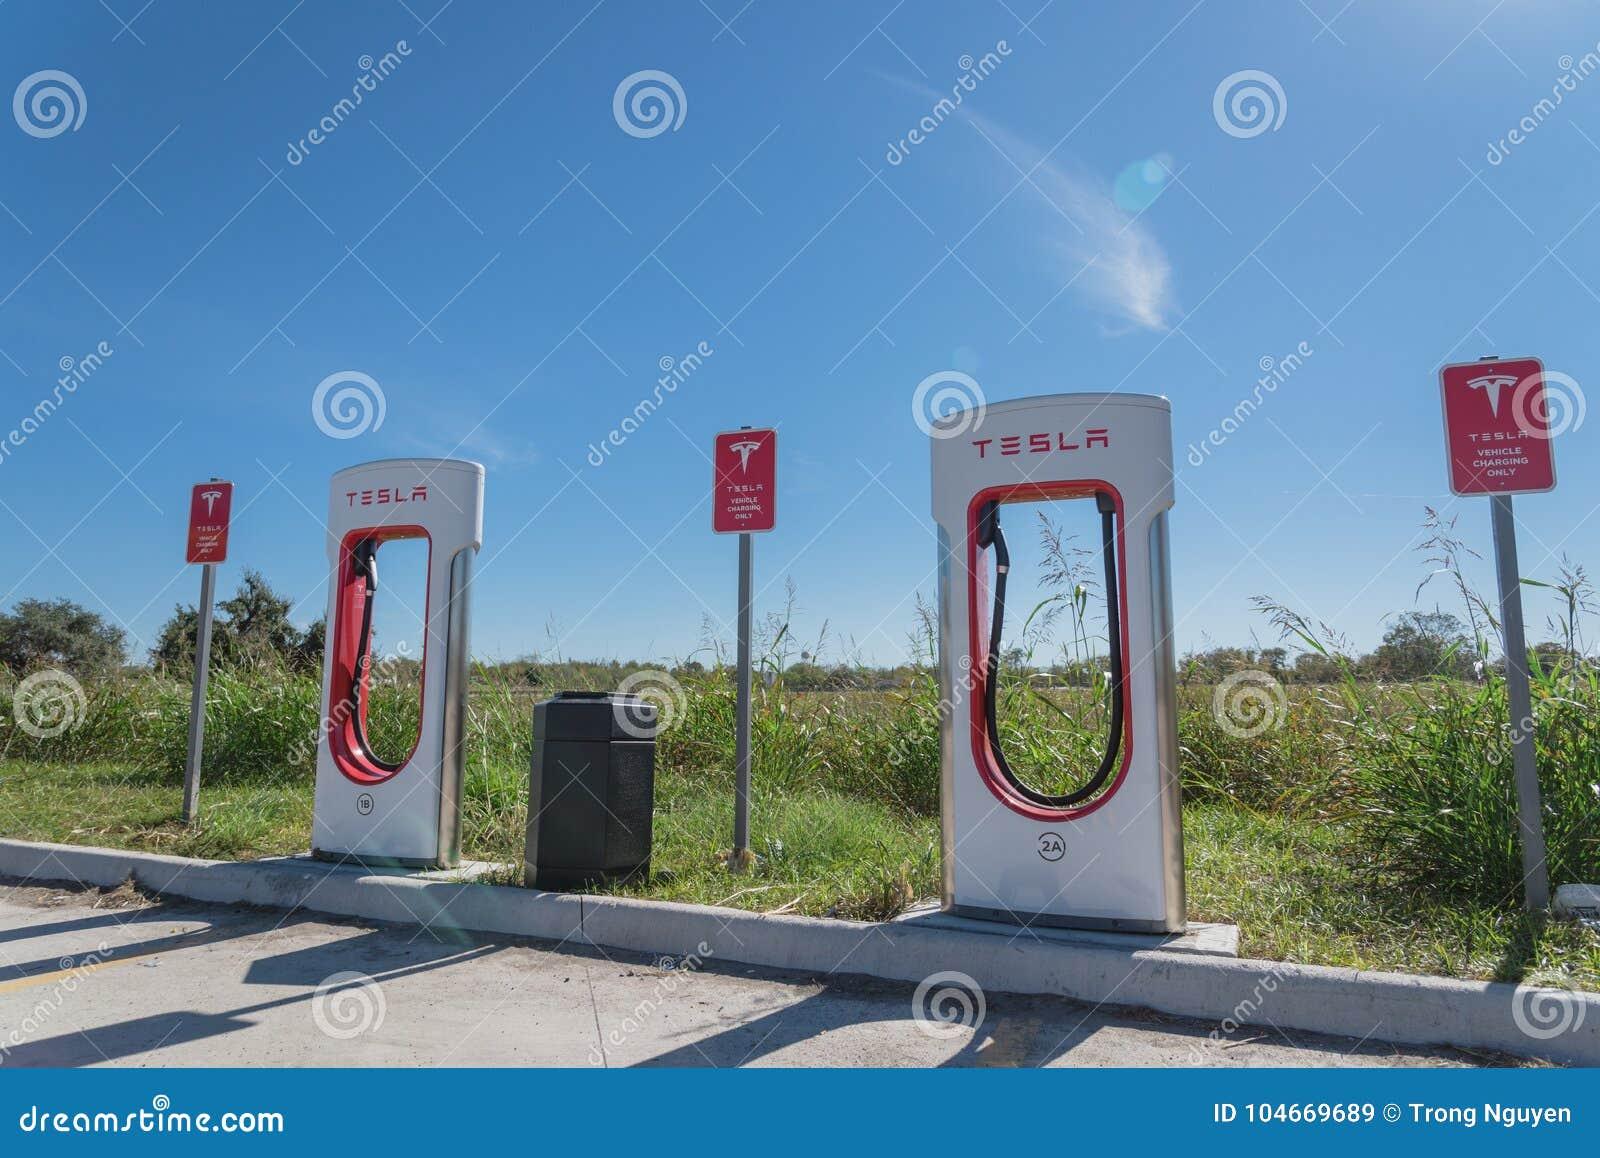 Tesla Supercharger In Flatonia, Texas, USA Editorial Stock Image